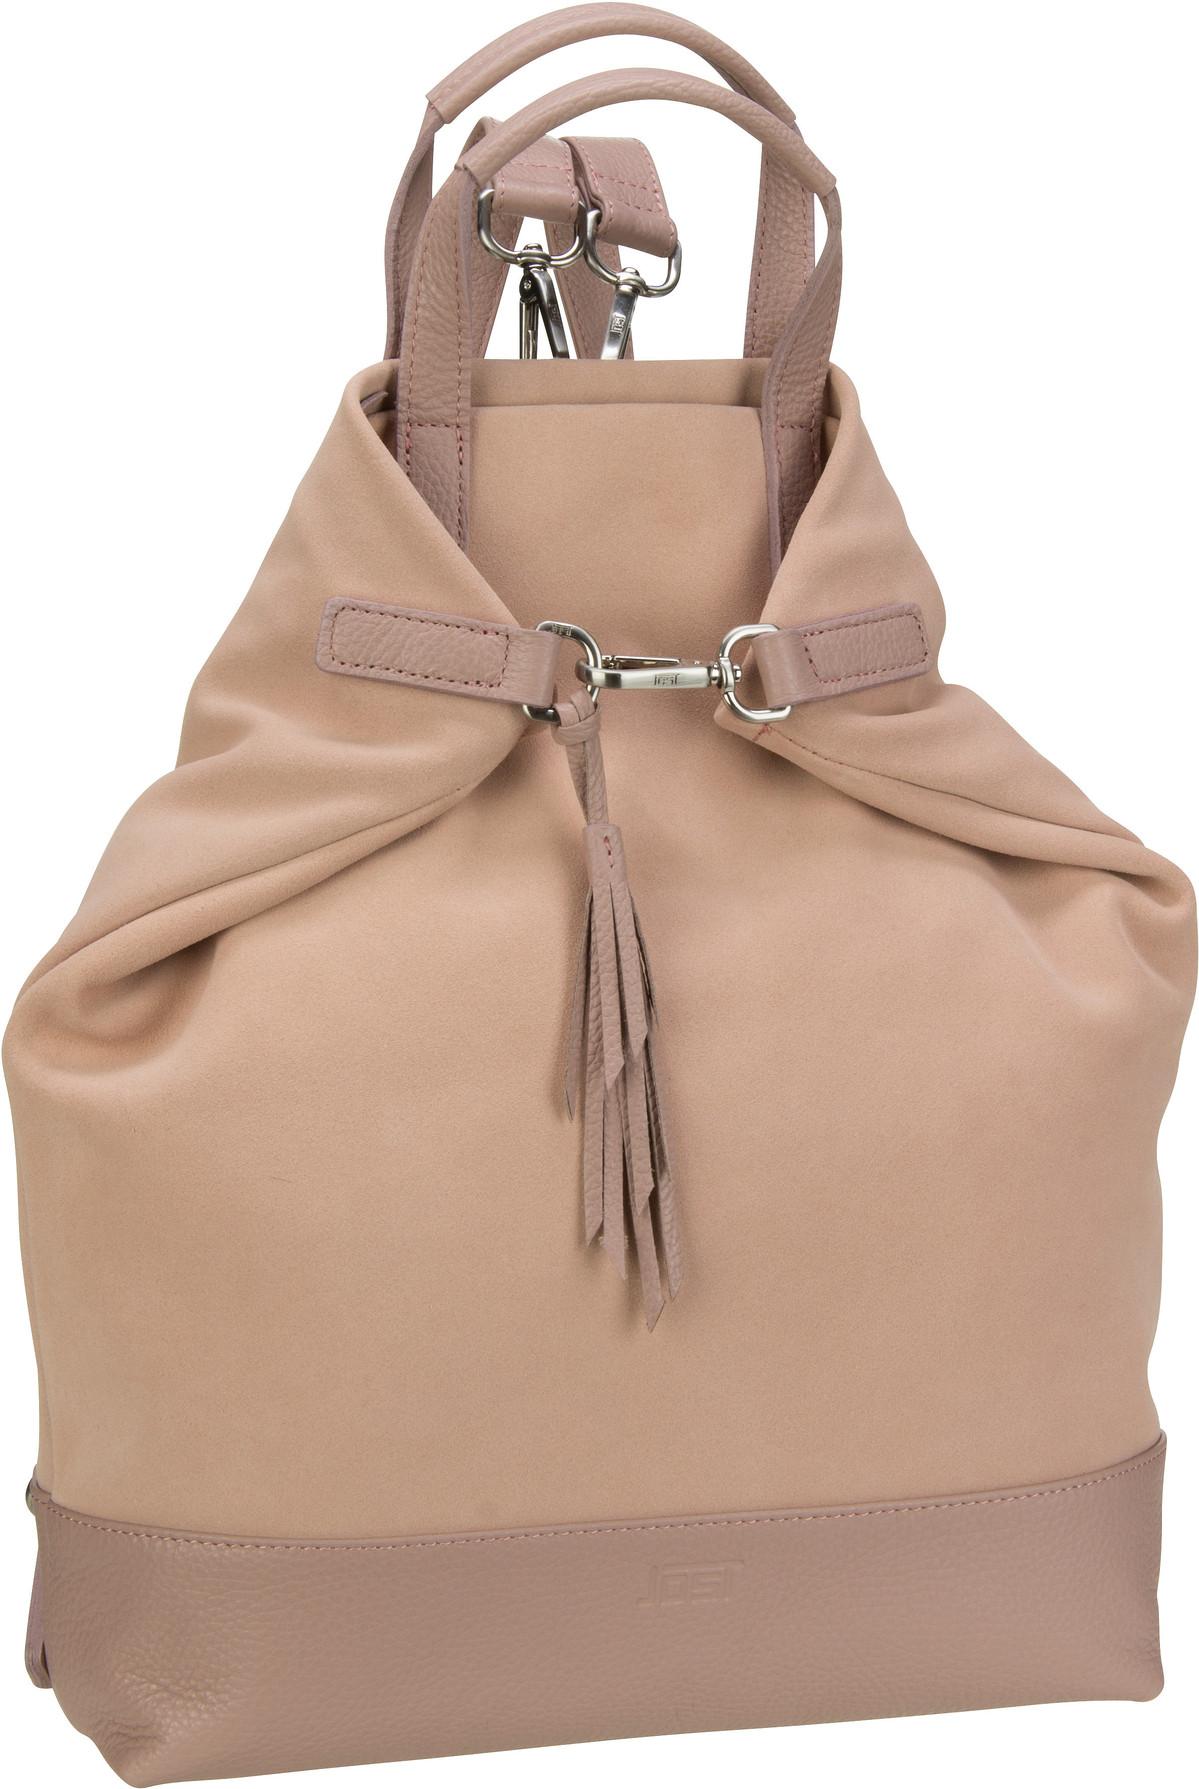 Rucksack / Daypack Motala 1730 X-Change 3in1 Bag S Rosewood